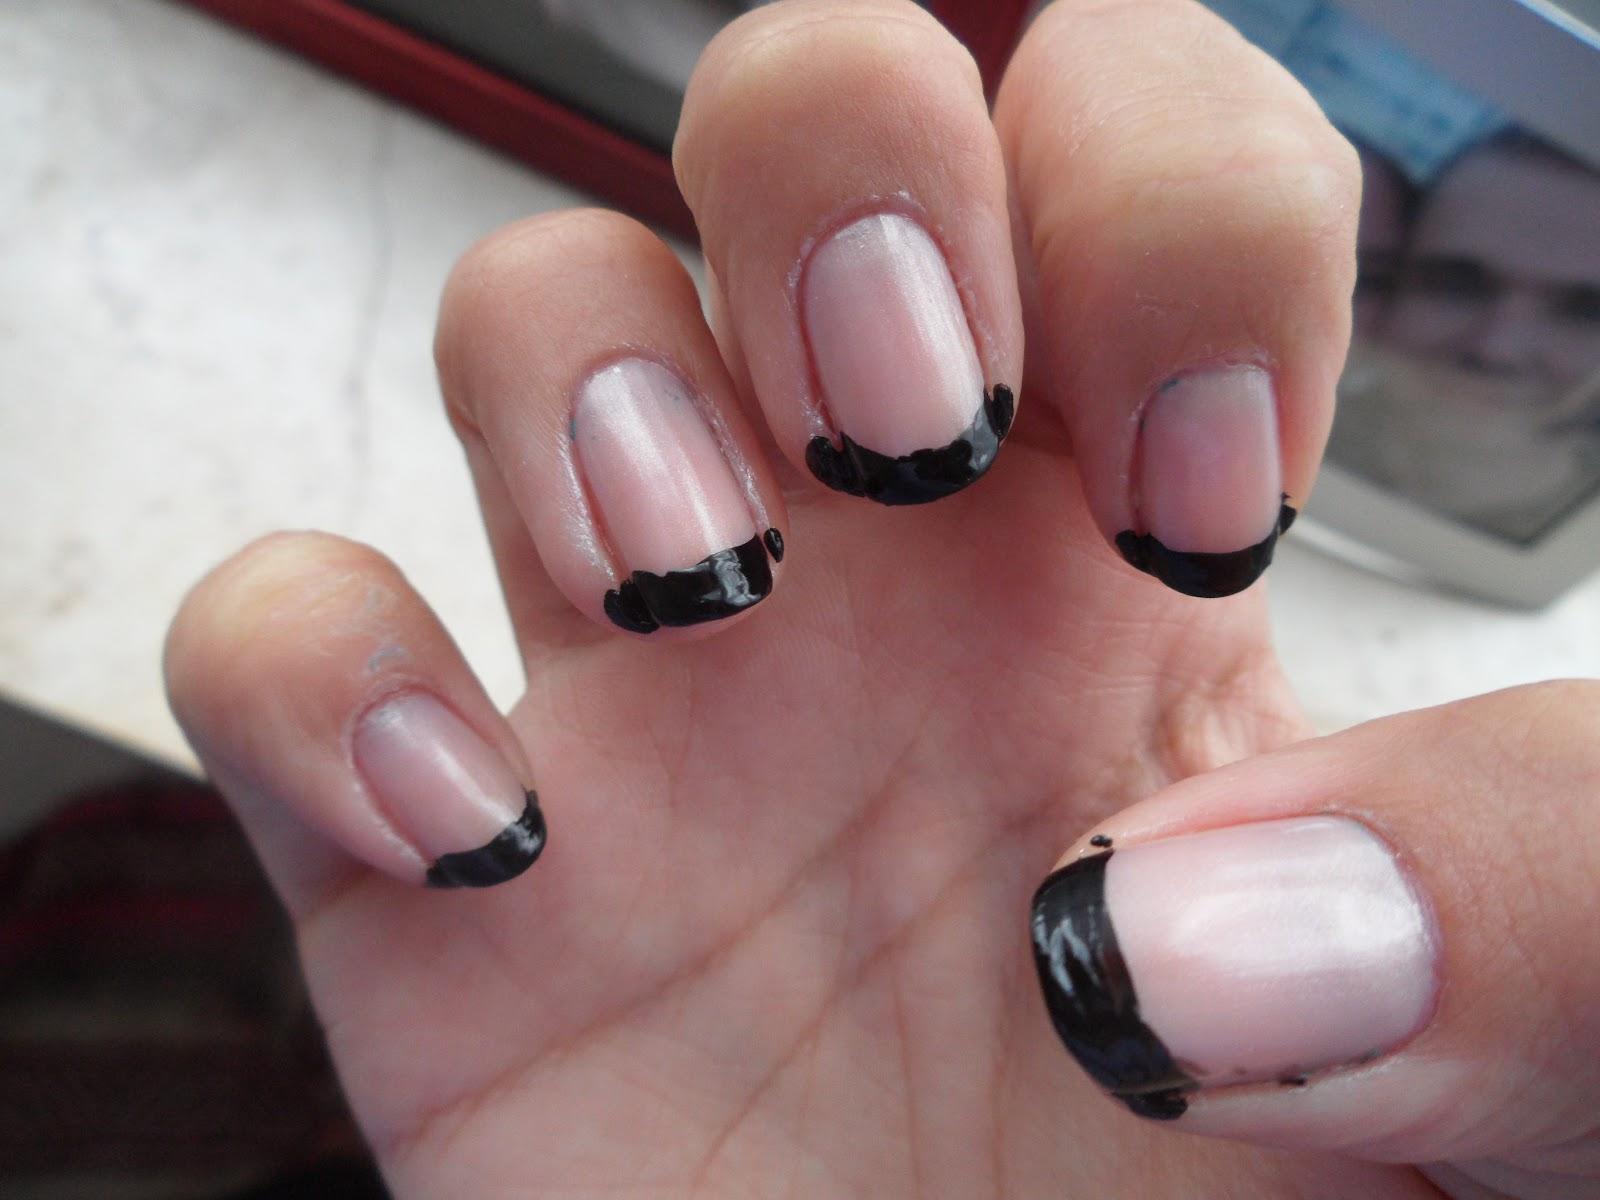 French tip manicure brush splendid wedding company french tip manicure brush solutioingenieria Images